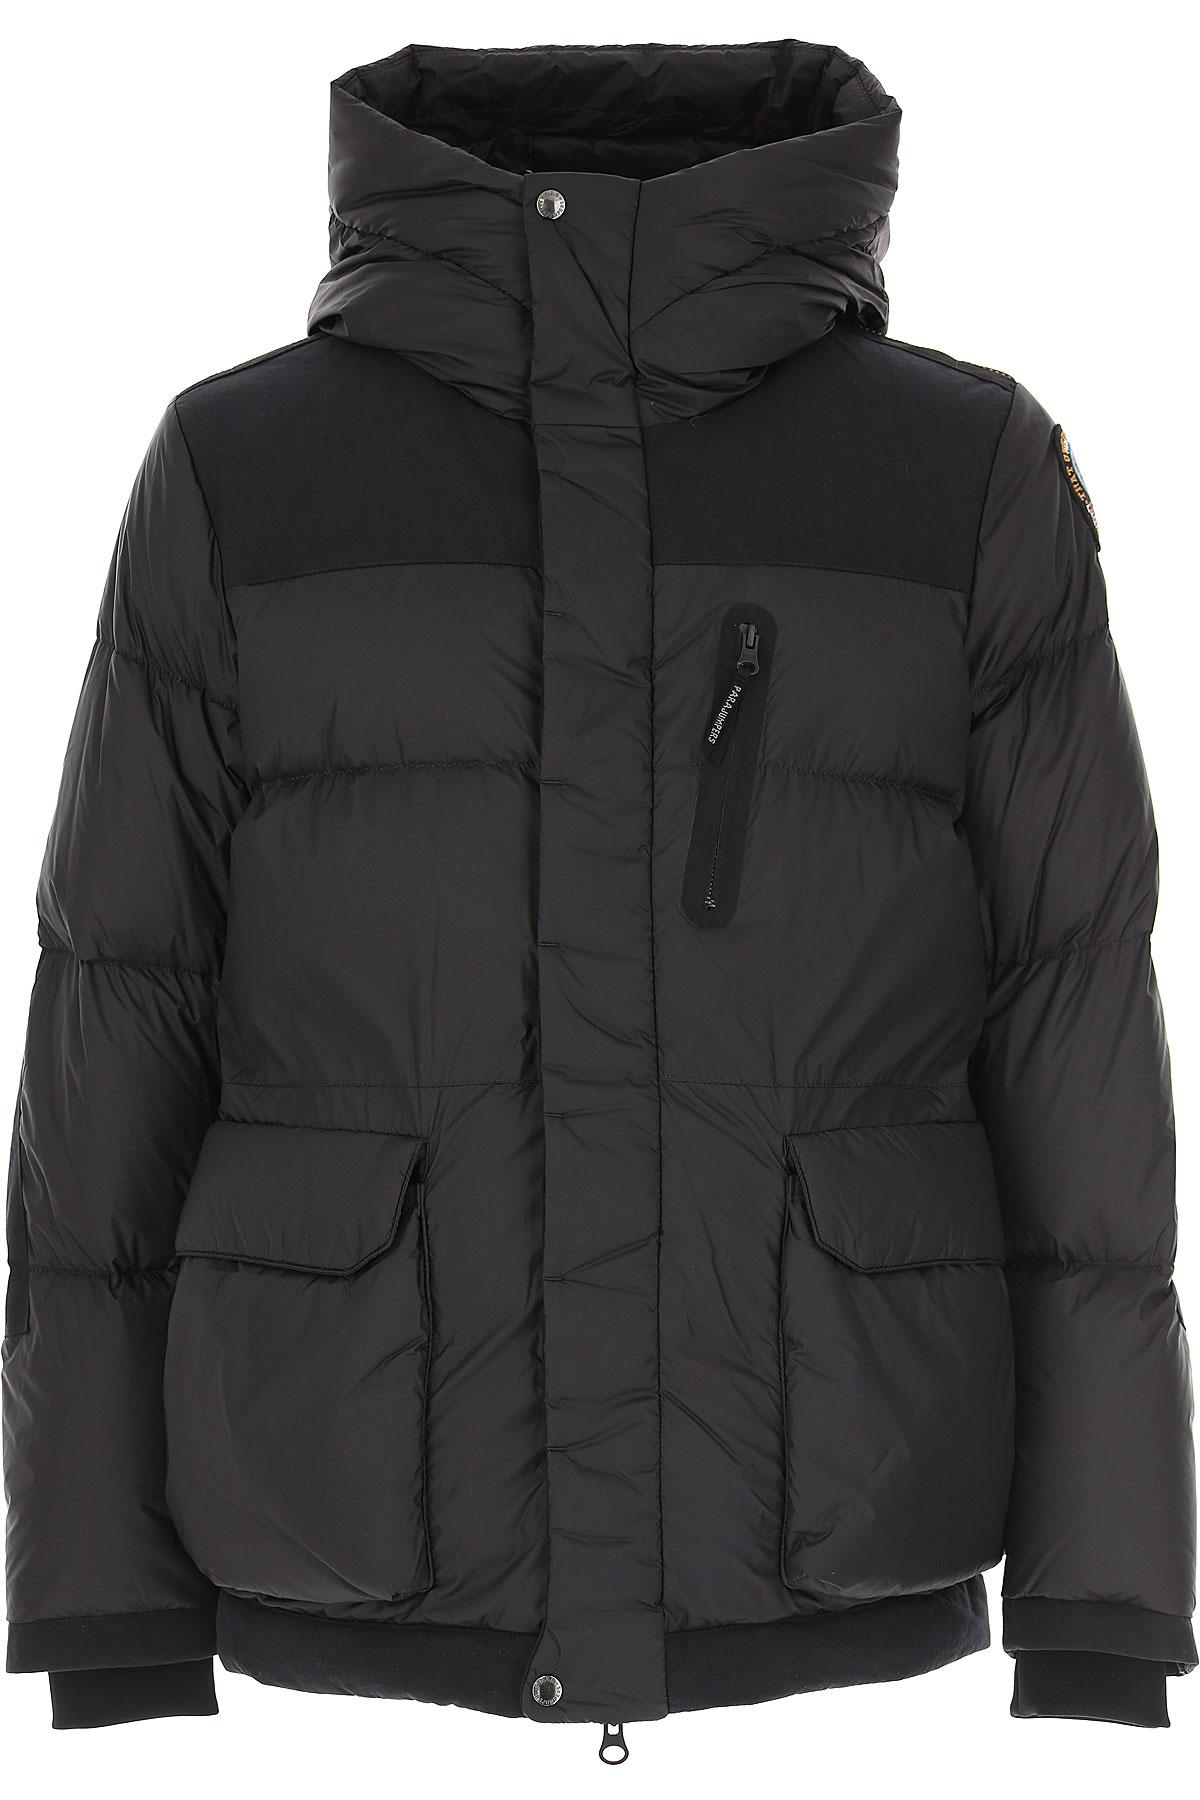 Parajumpers Down Jacket for Men, Puffer Ski Jacket On Sale, Black, polyamide, 2019, L M XL